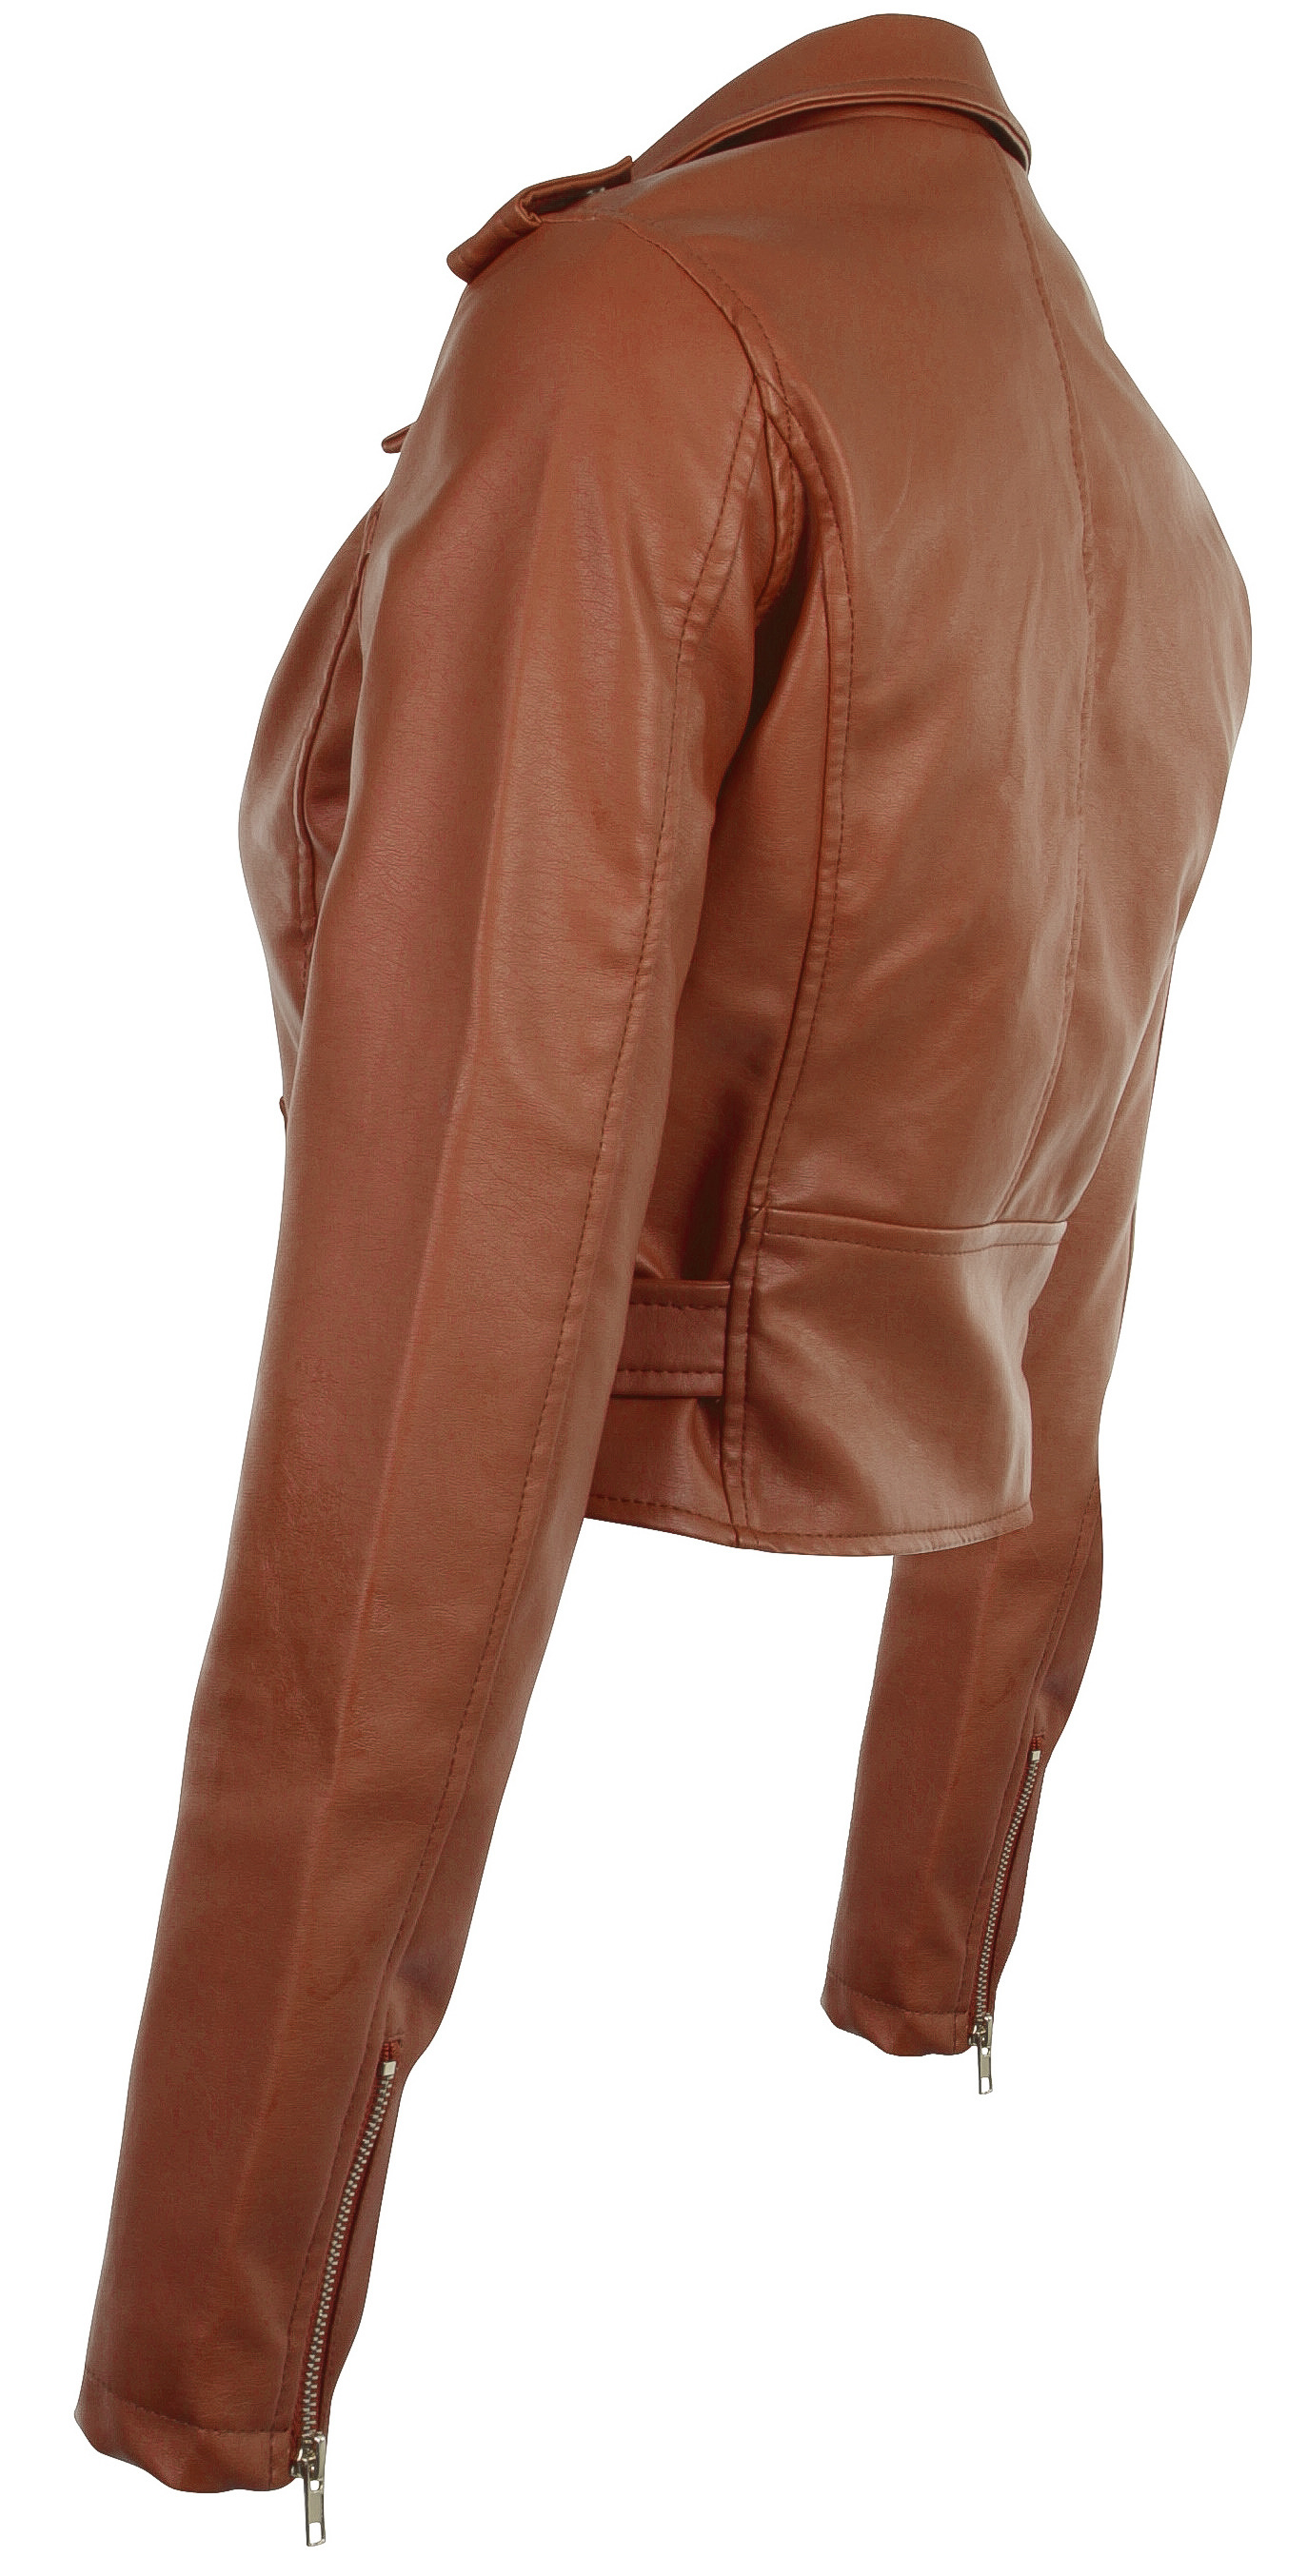 Women-039-s-Juniors-Fashionable-Cropped-Faux-Leather-Moto-Biker-Jacket thumbnail 23